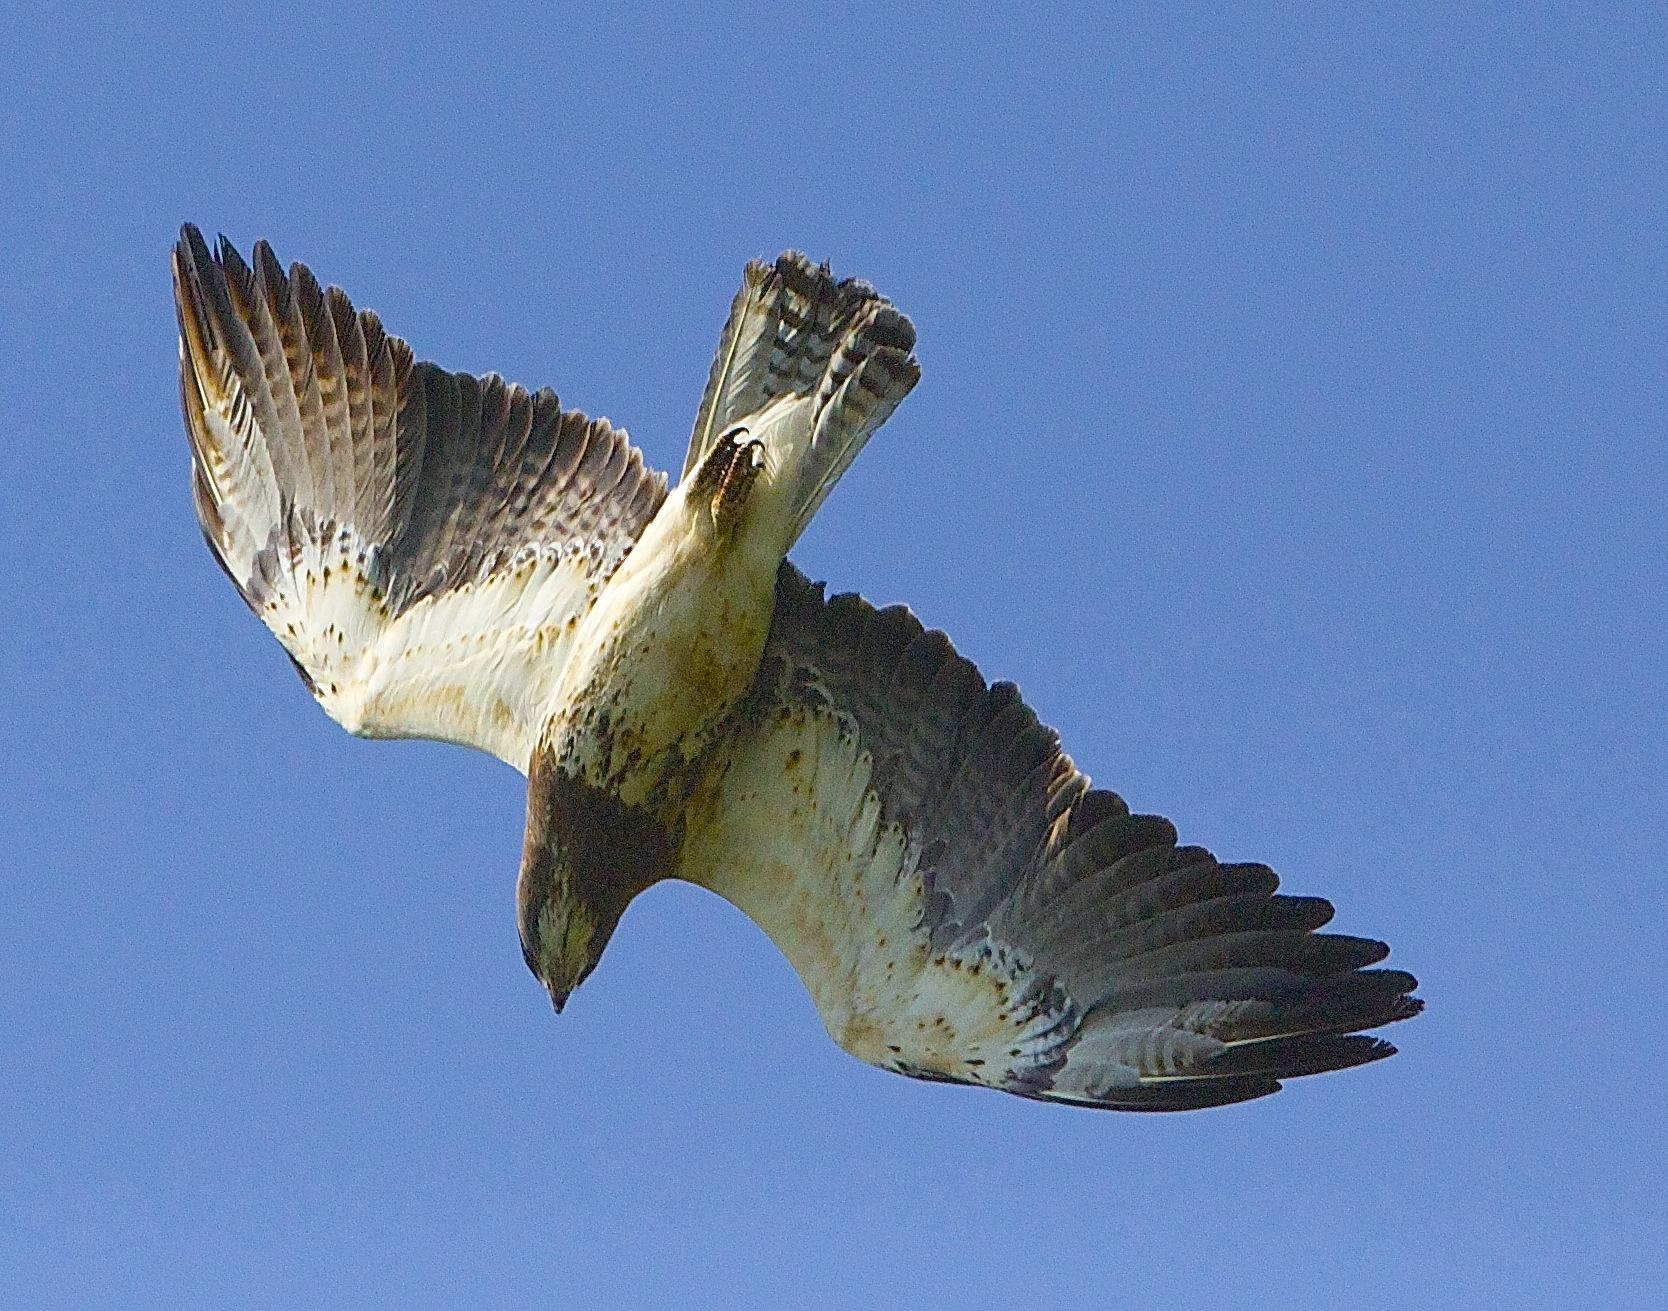 Swainson's hawk starting dive